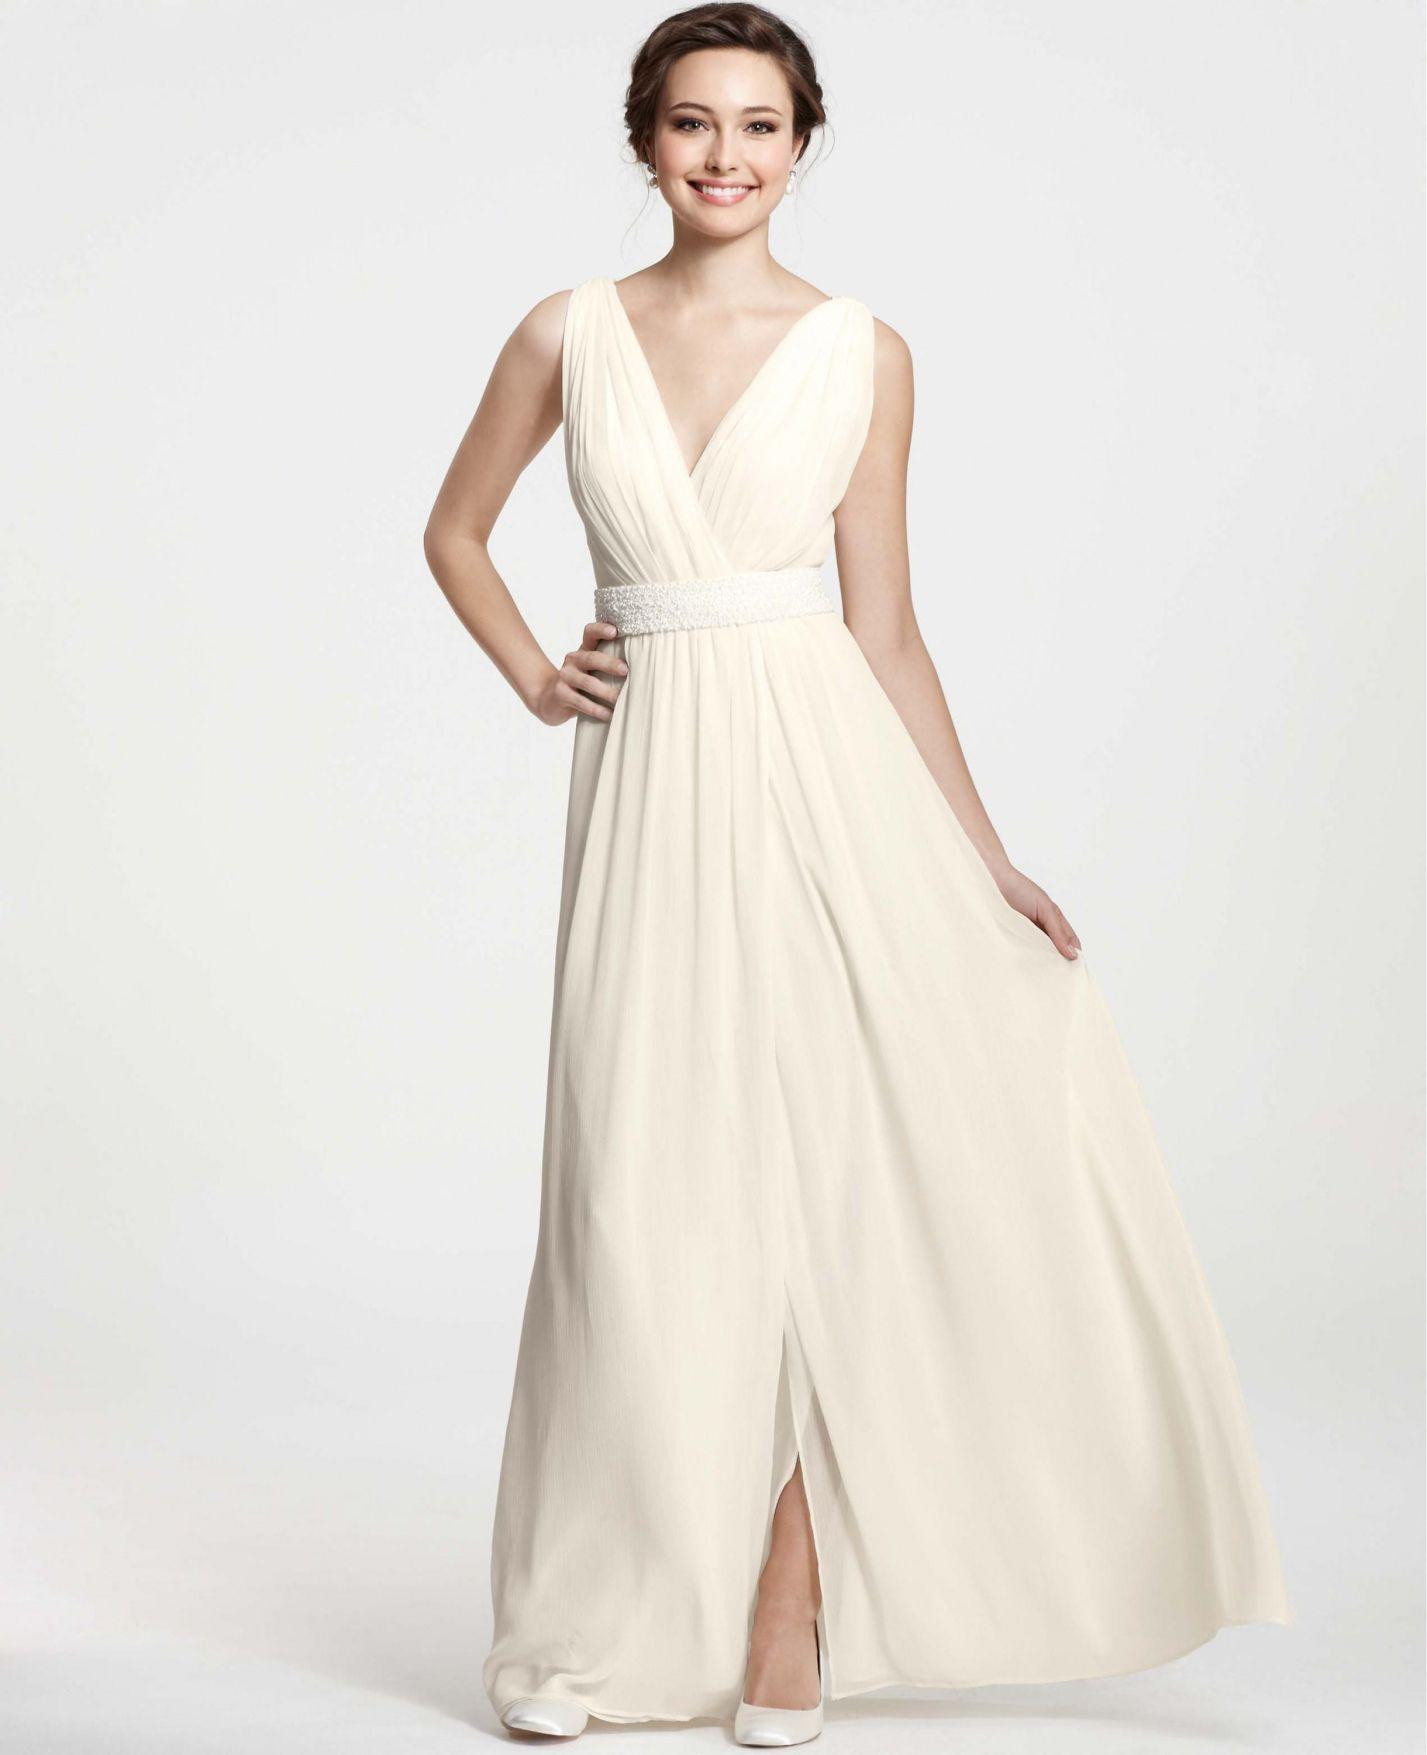 99+ Ann Taylor Wedding Dresses - Dresses for Wedding Reception Check ...